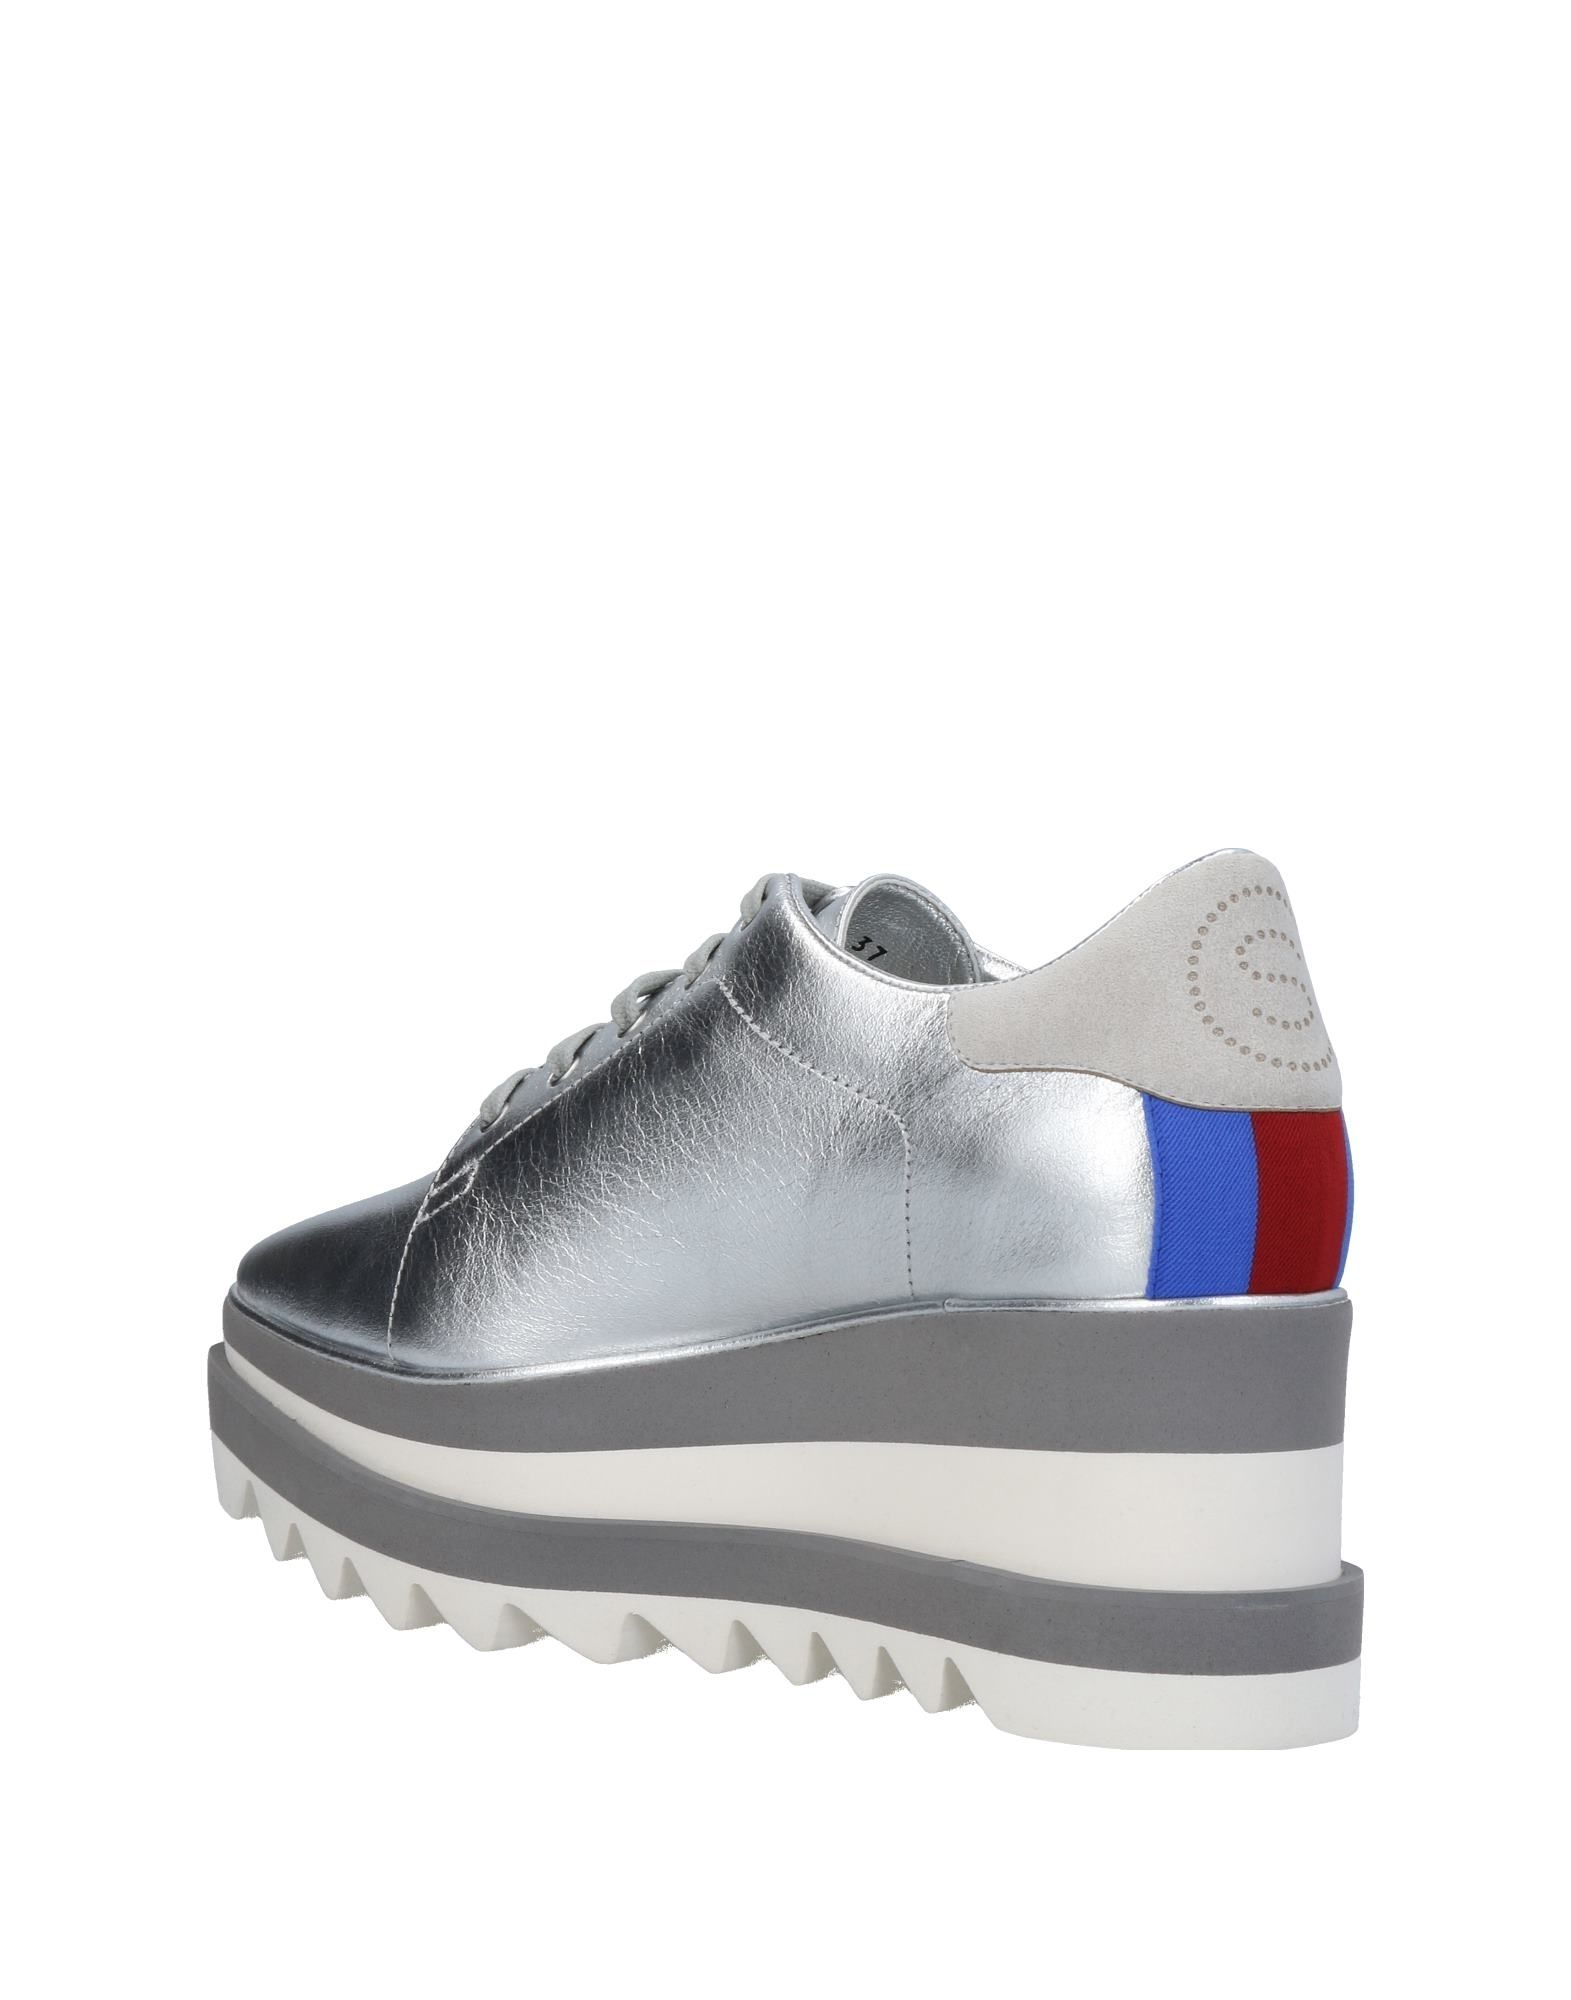 Stella Mccartney  Sneakers Damen  Mccartney 11422788HM Beliebte Schuhe 6cd847